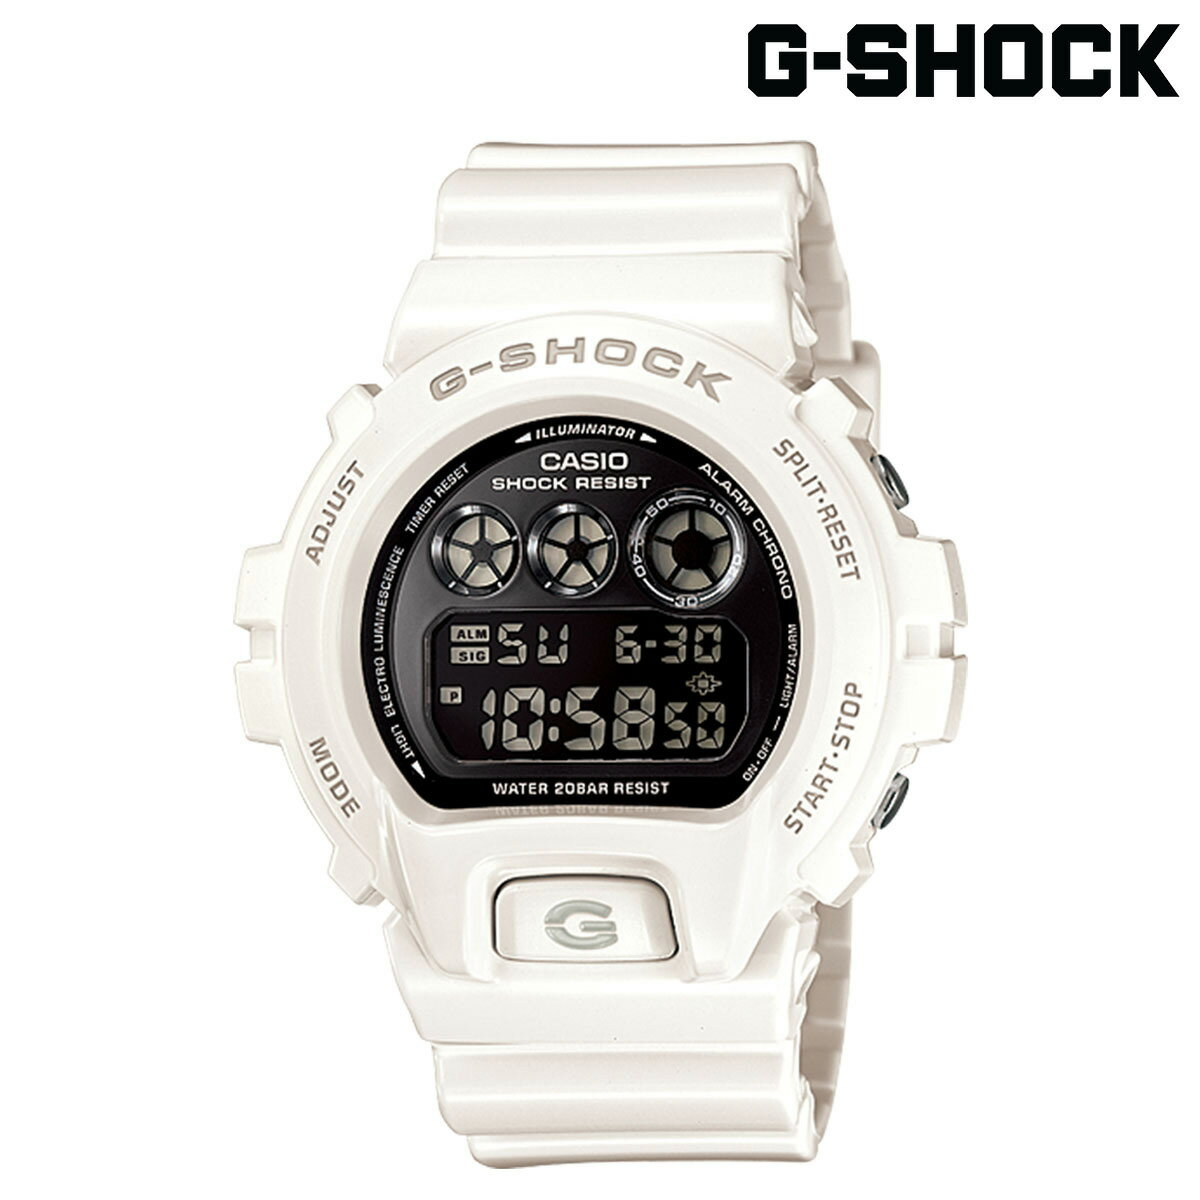 G-SHOCK DW-6900NB-7JF